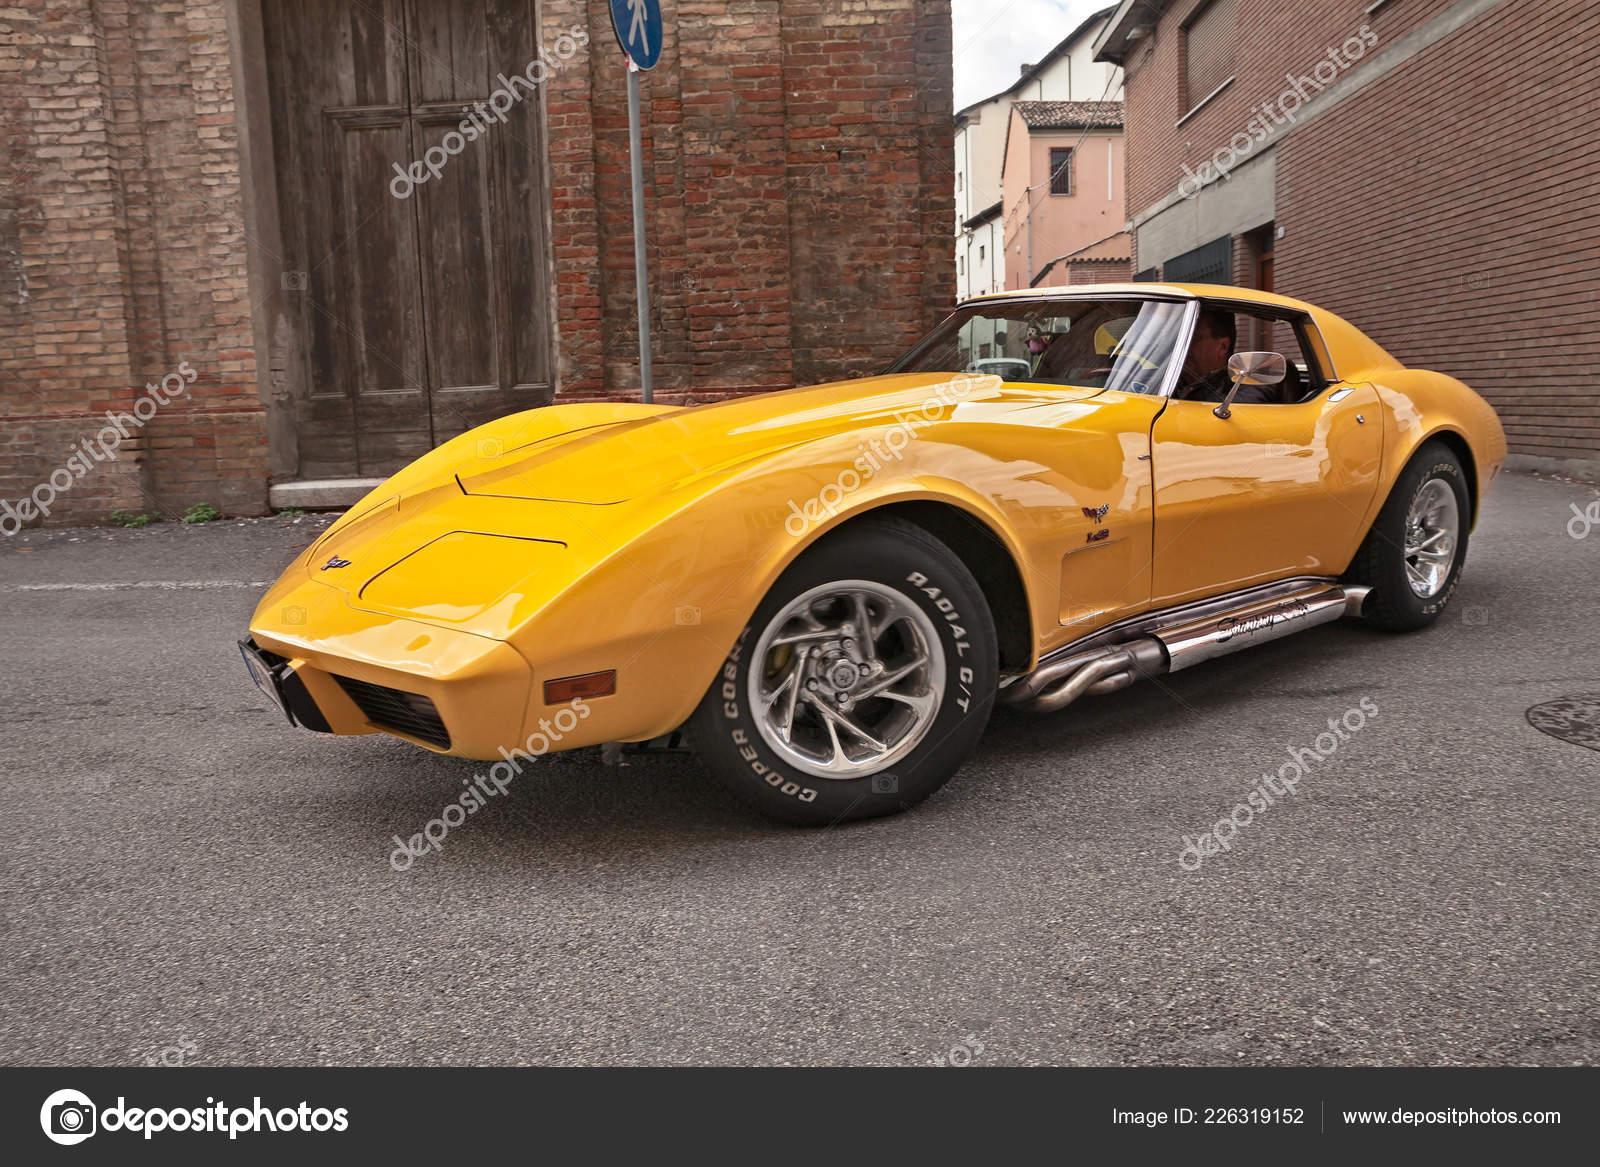 Classic American Sports Car Cheevrolet Corvette Stingray Seventies